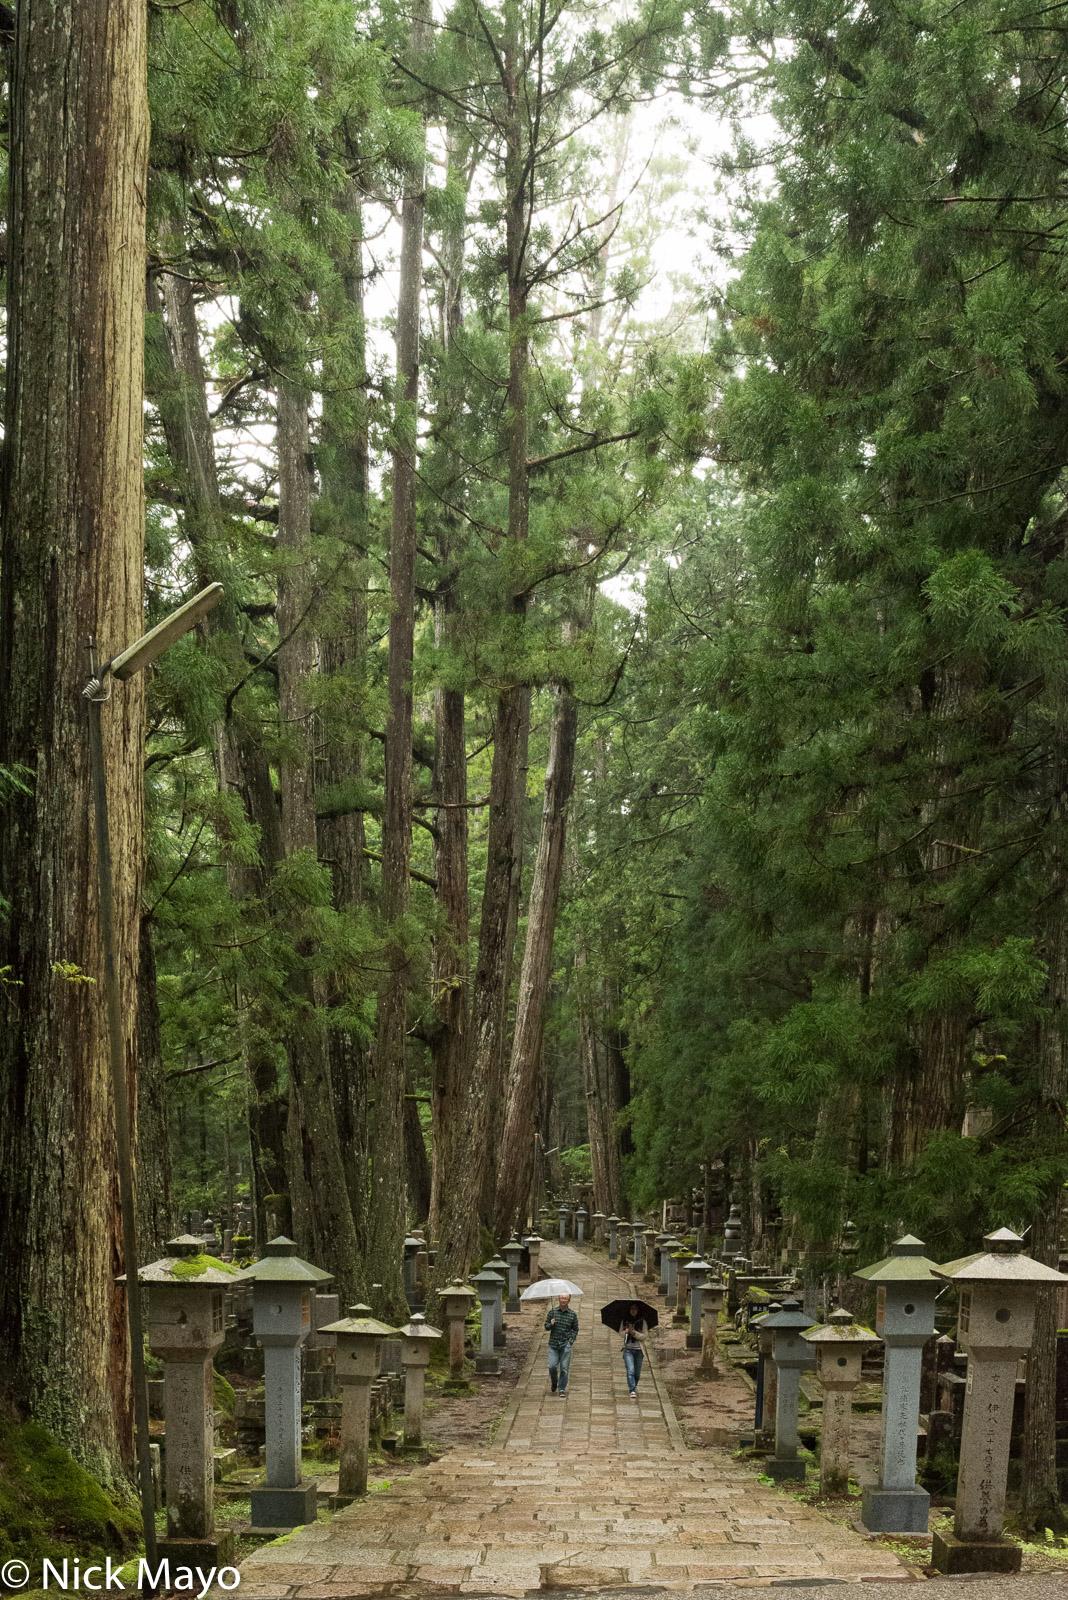 Cemetery, Japan, Kinki, photo